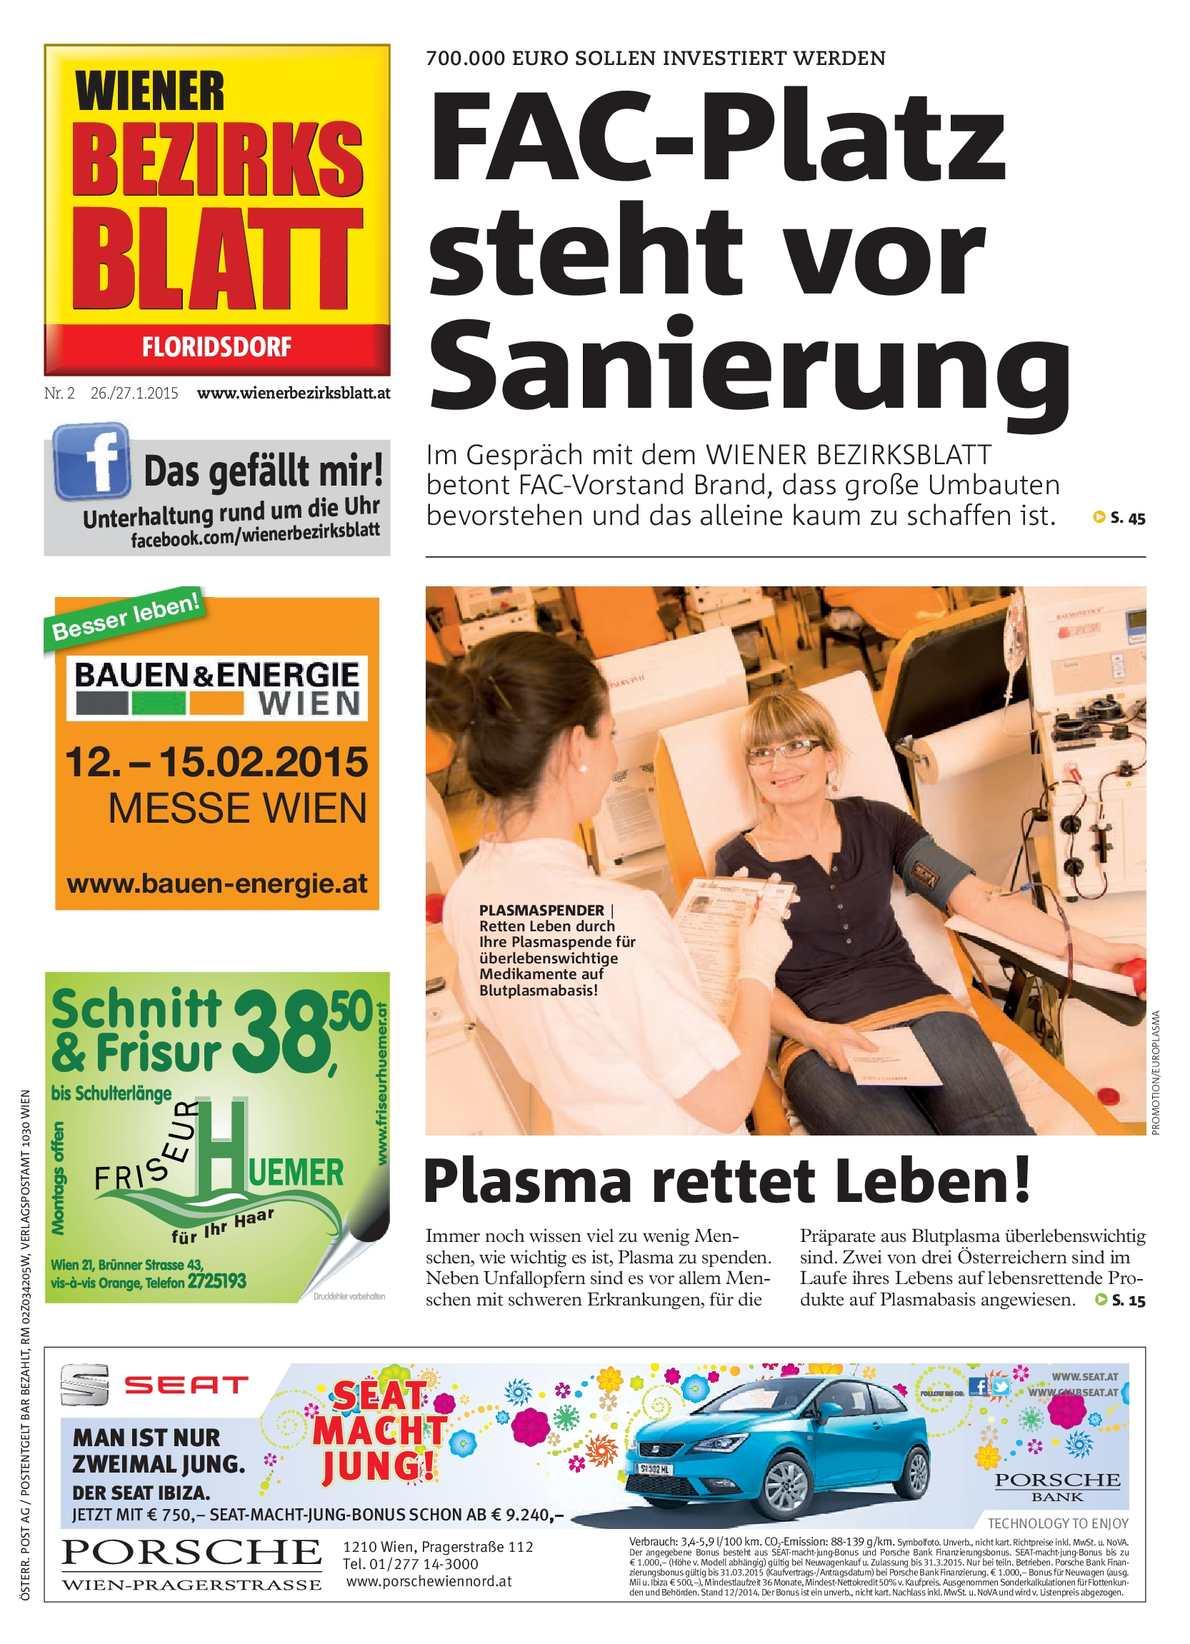 singles in Wien - Bekanntschaften - Partnersuche & Kontakte